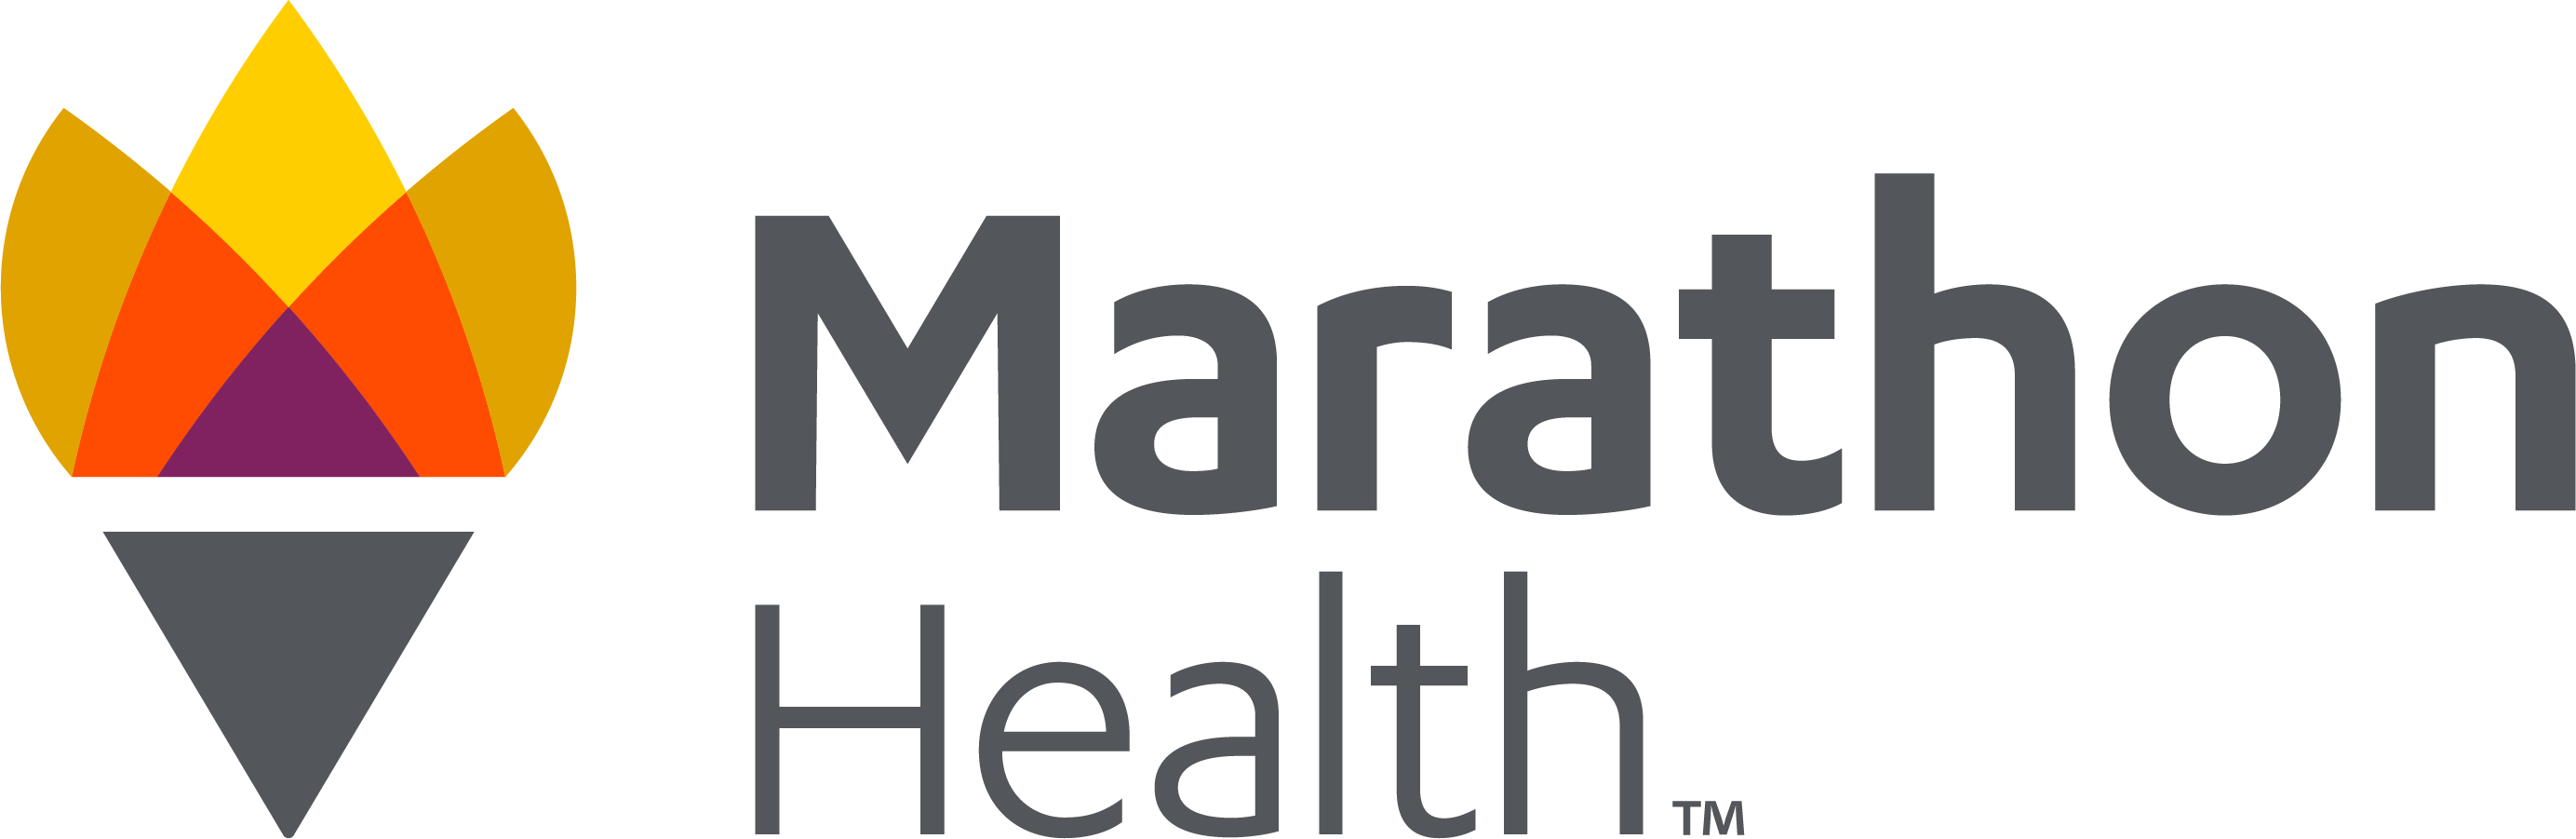 Marathon Health, Inc.